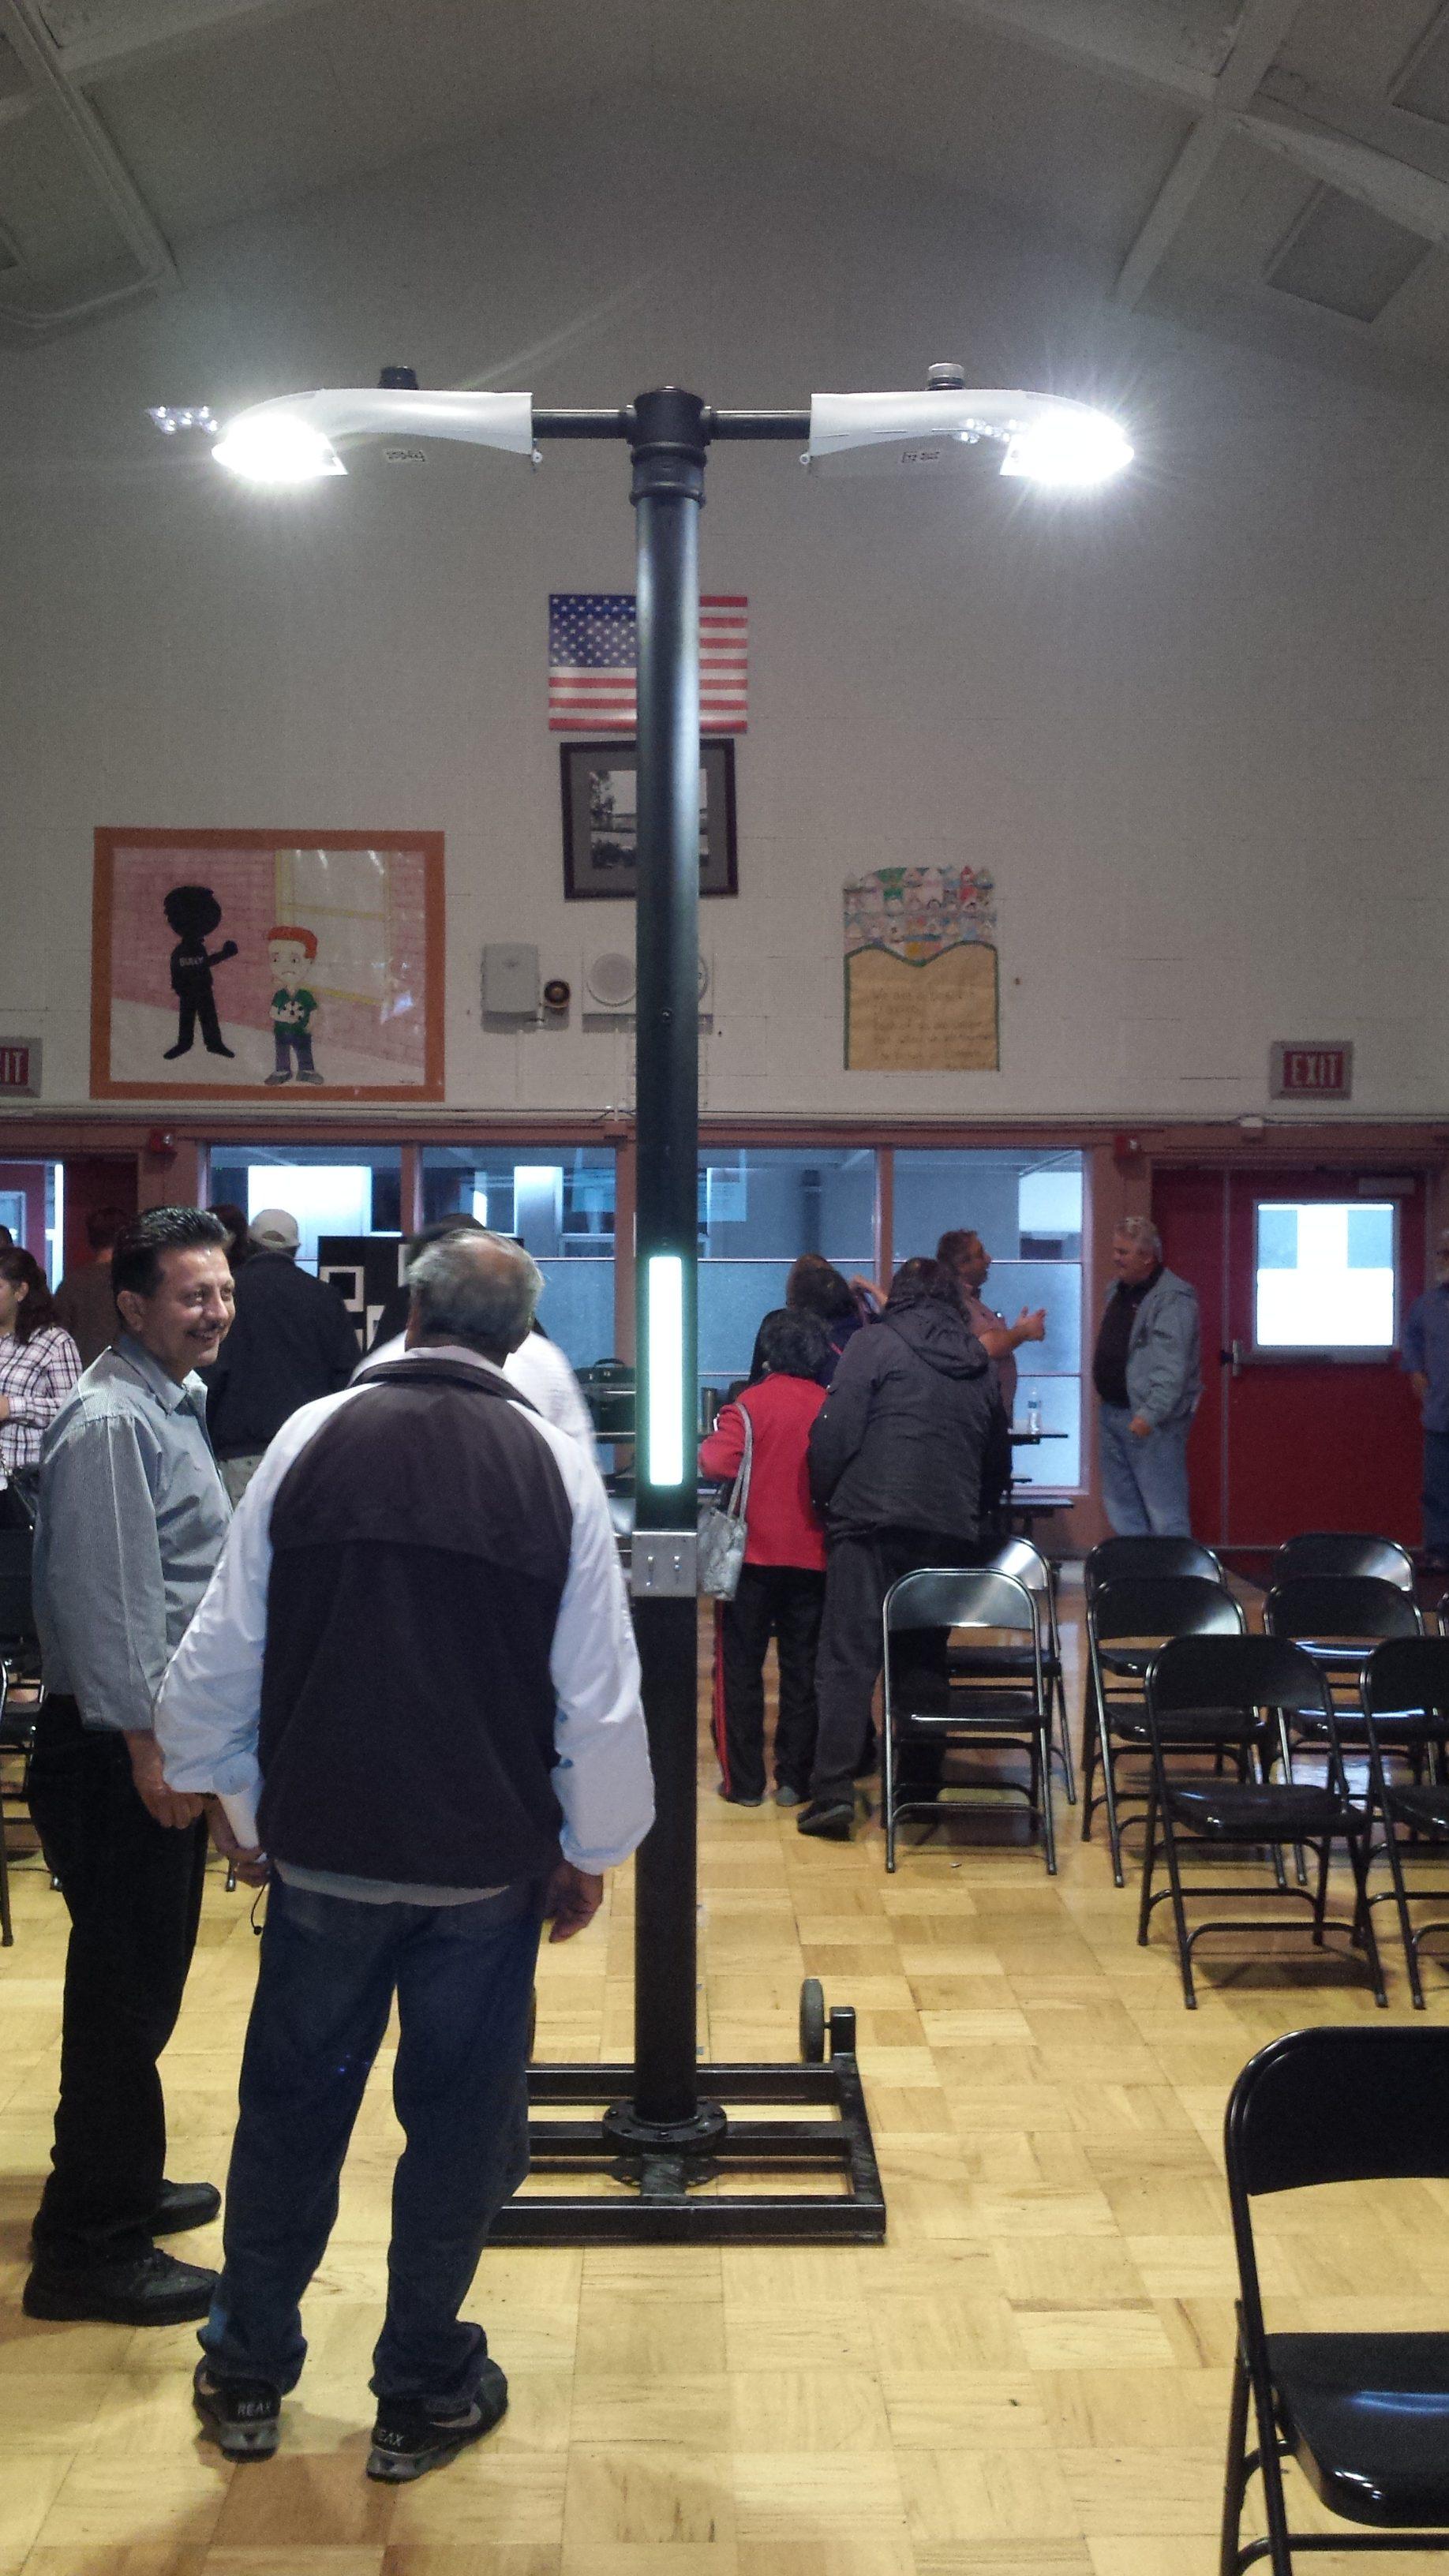 Residents at the Pecks Lot street lighting meeting Photo: Bill Demeter